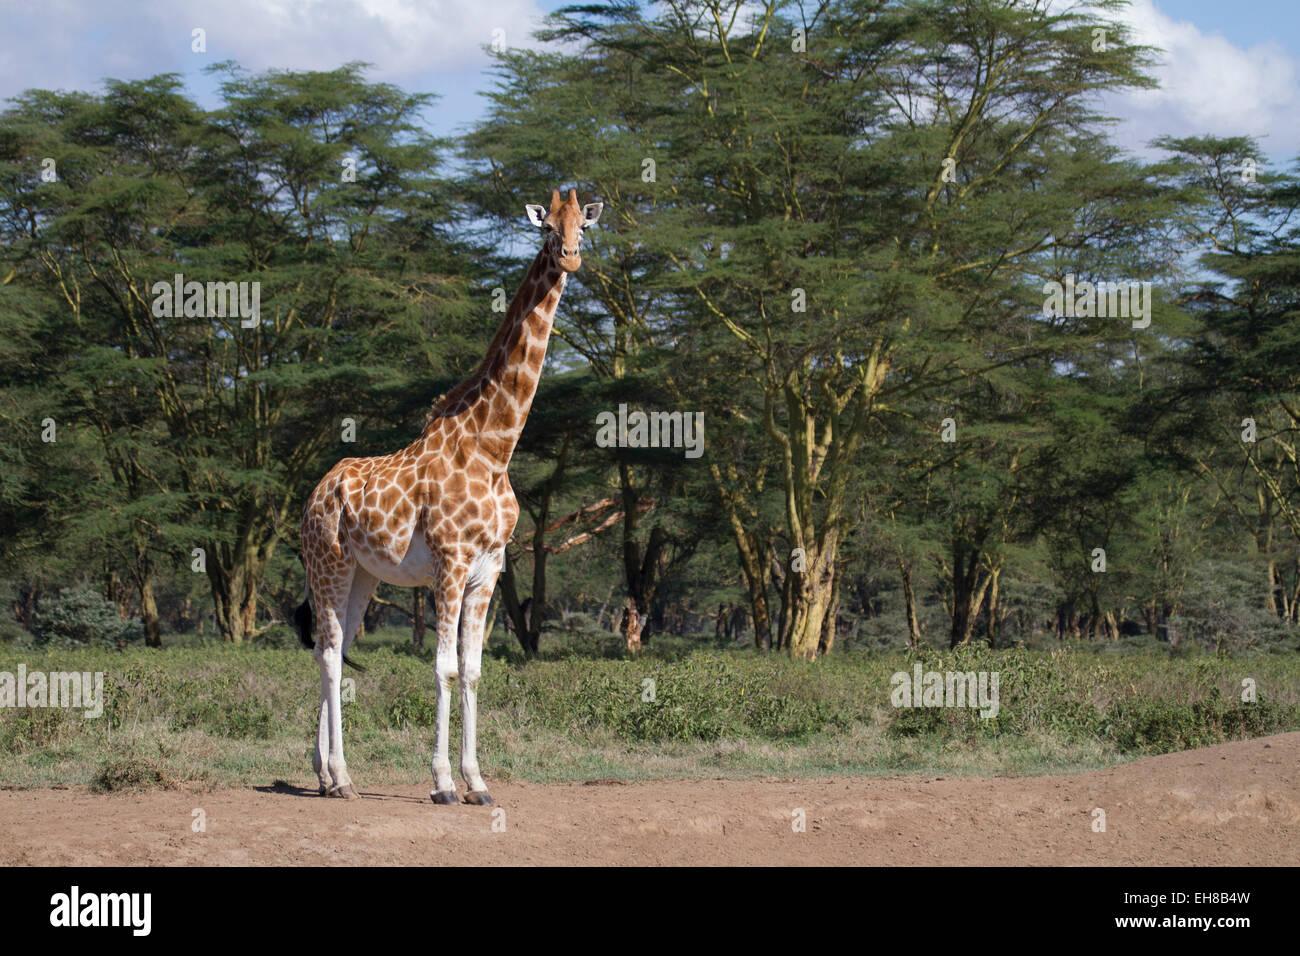 Rothschild's giraffe (Giraffa camelopardalis rothschildi) - Stock Image